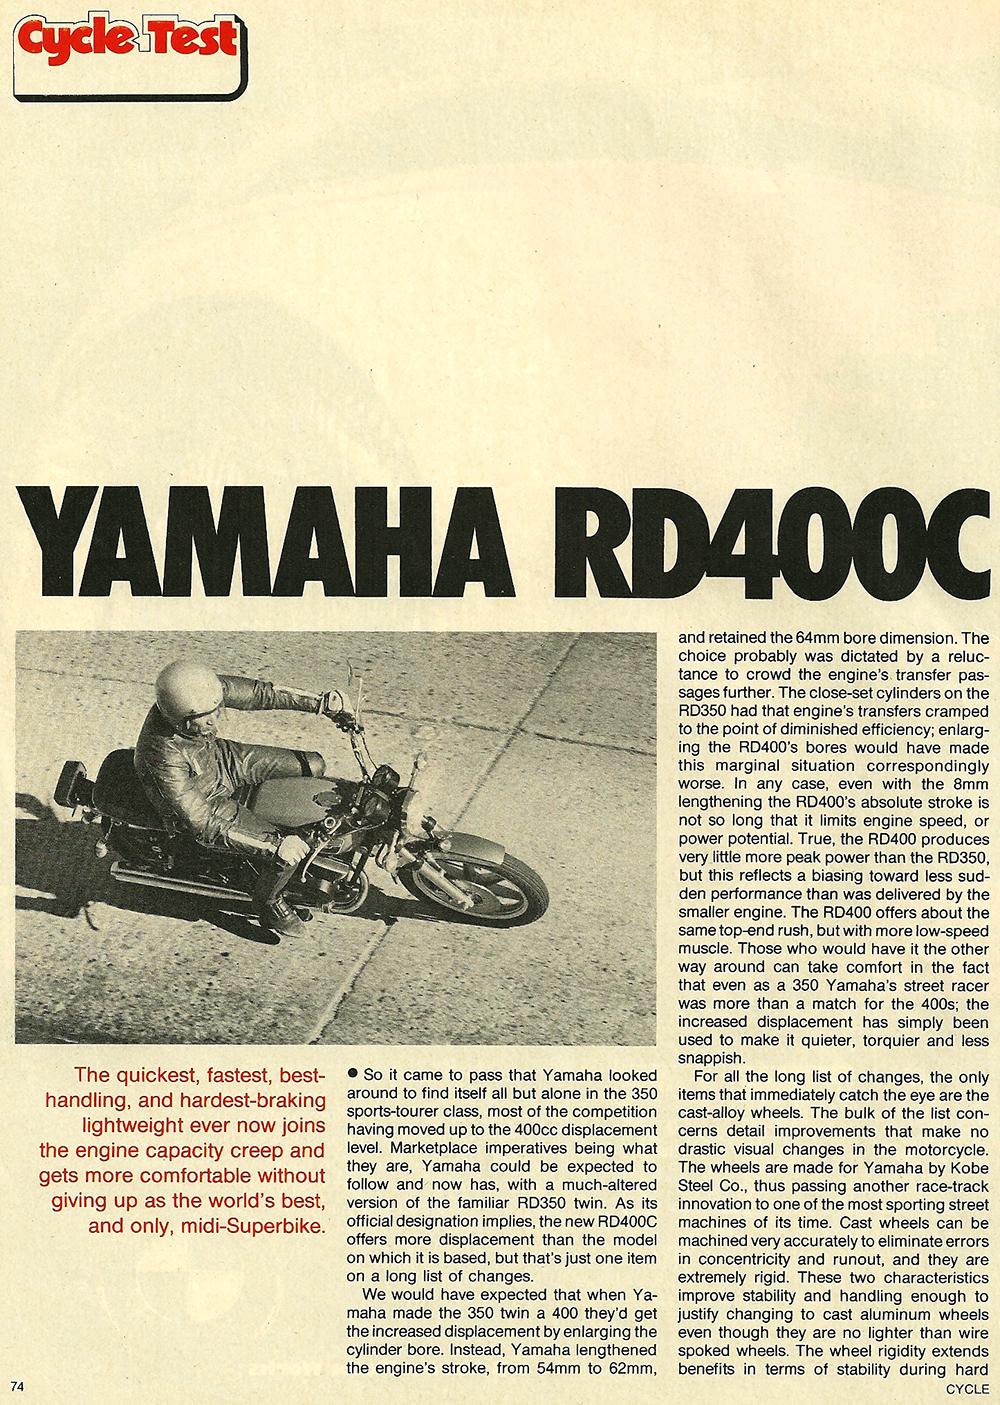 1976 Yamaha RD400C road test 1.jpg